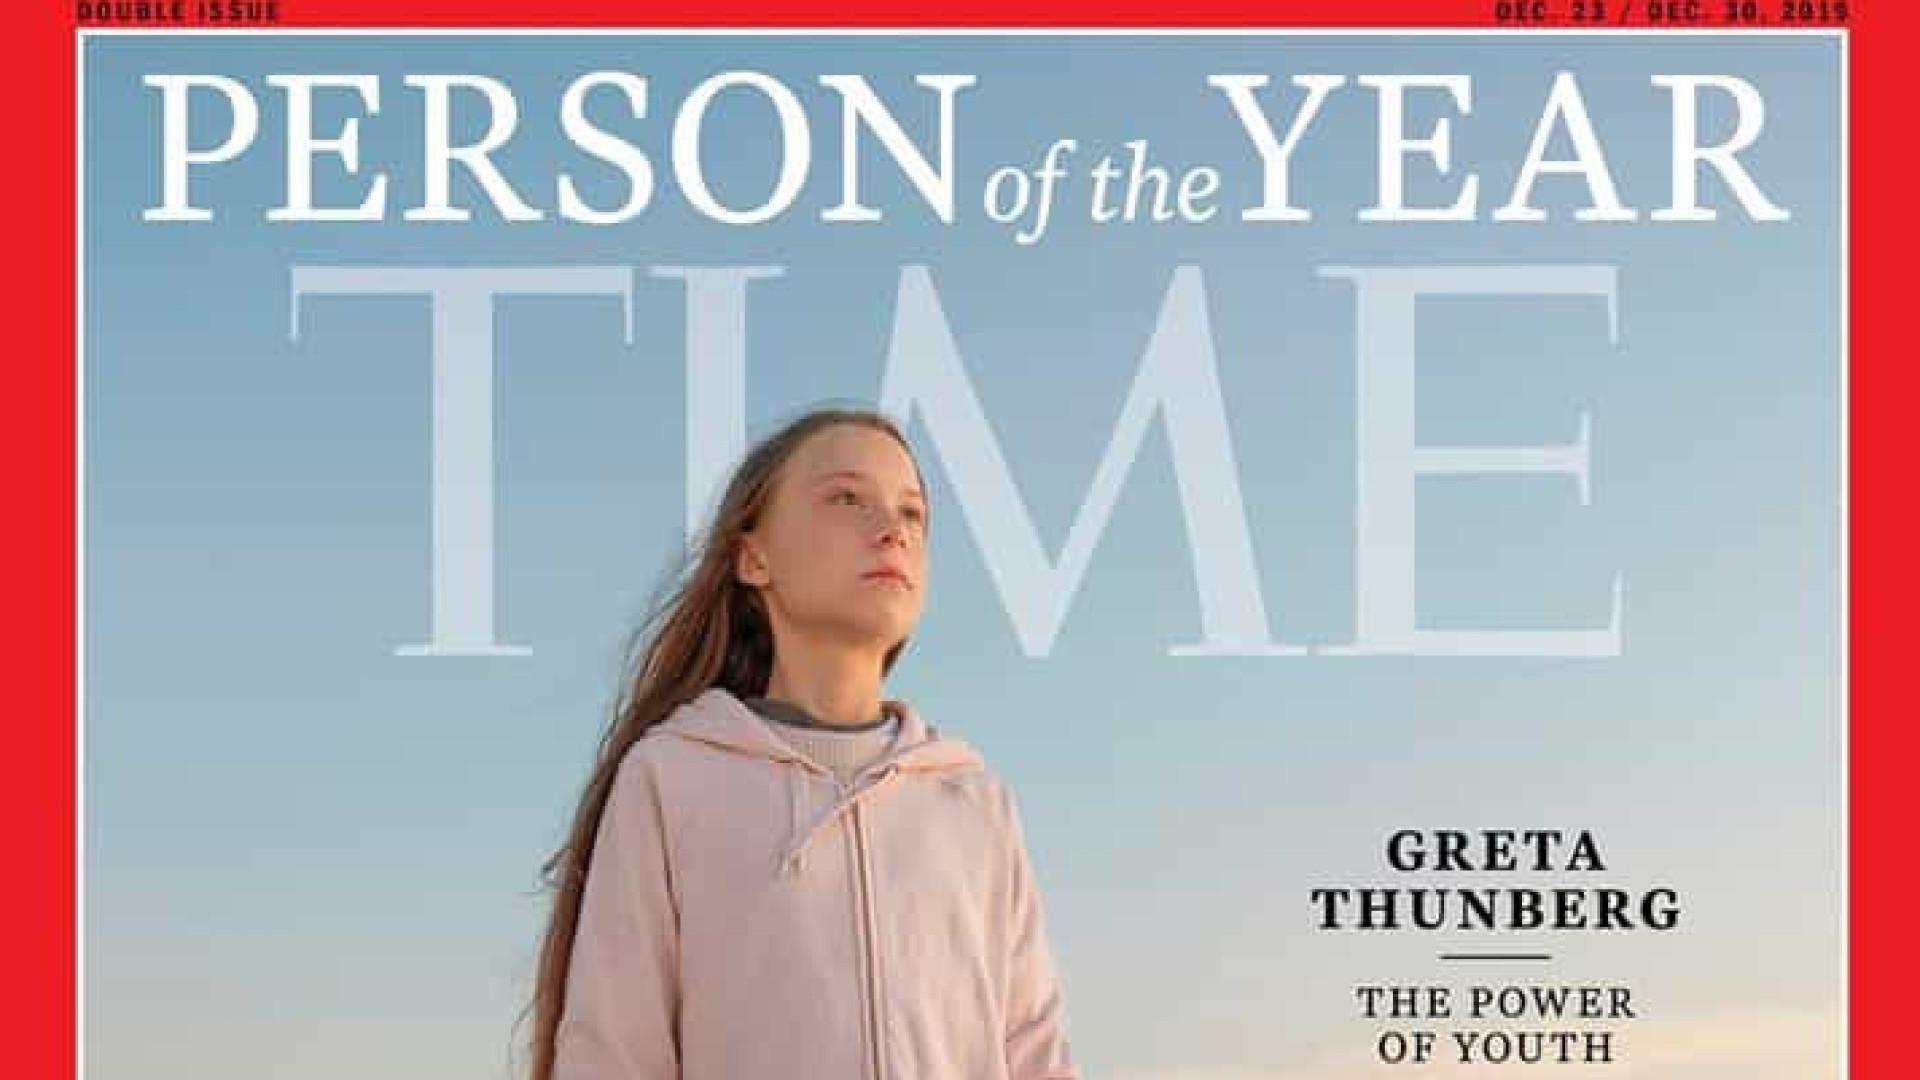 Greta Thunberg é a Personalidade do Ano para a revista Time